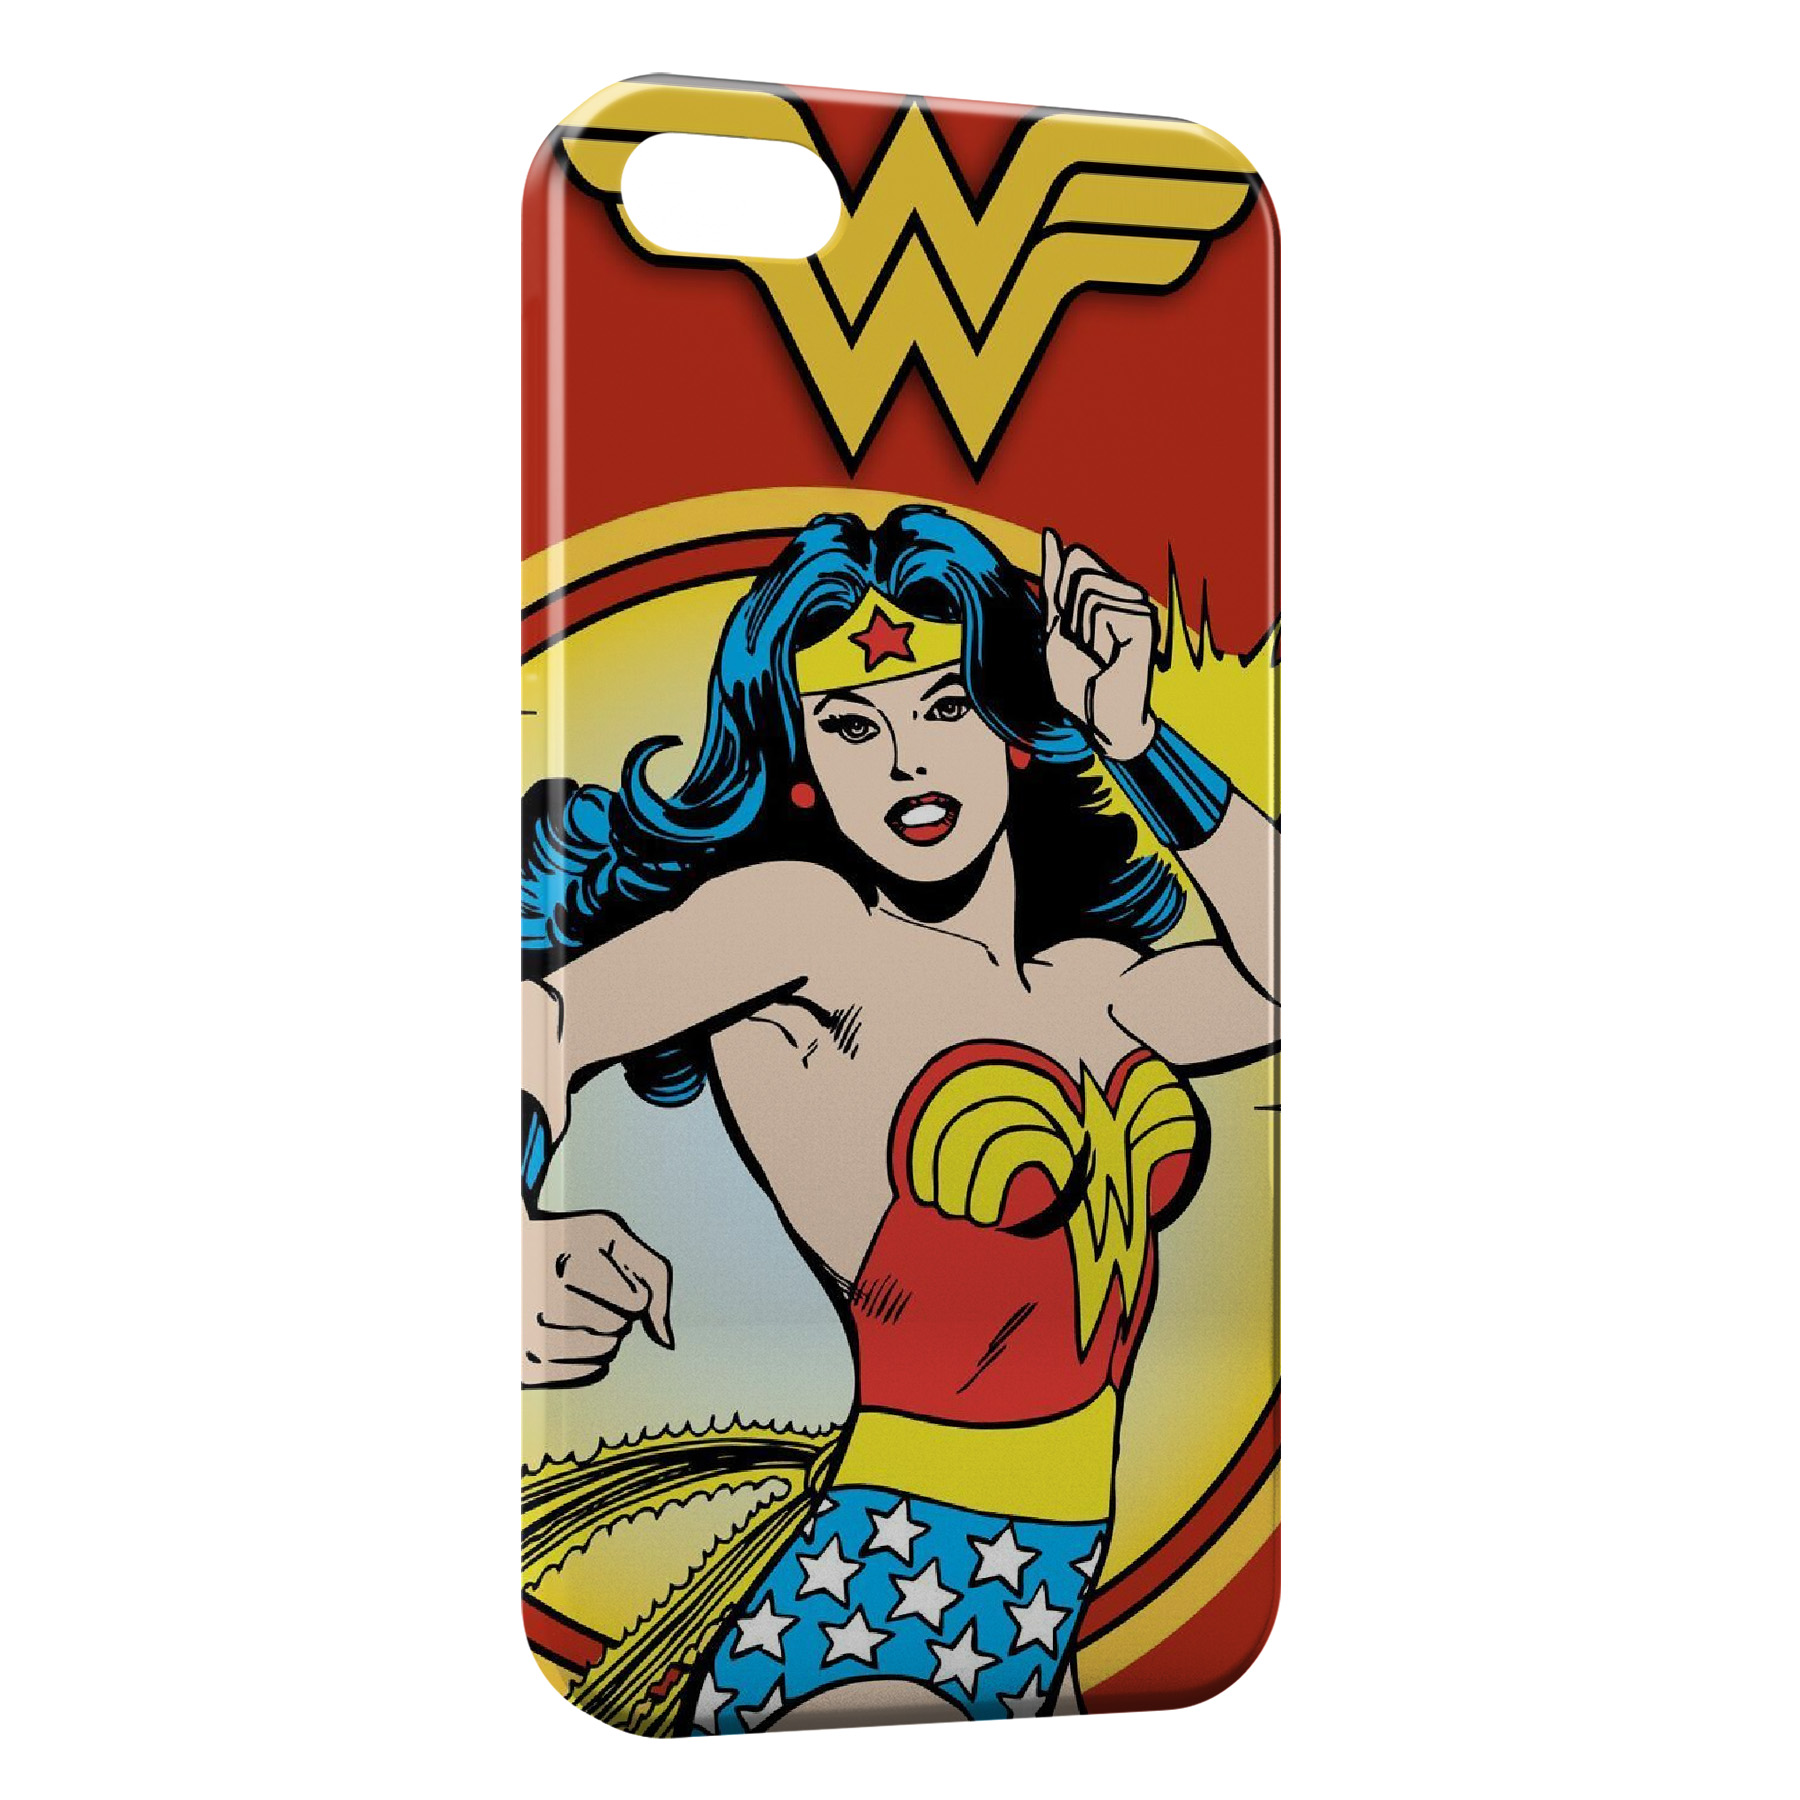 Coque iPhone 5C Superwoman Advengers Vintage Comics